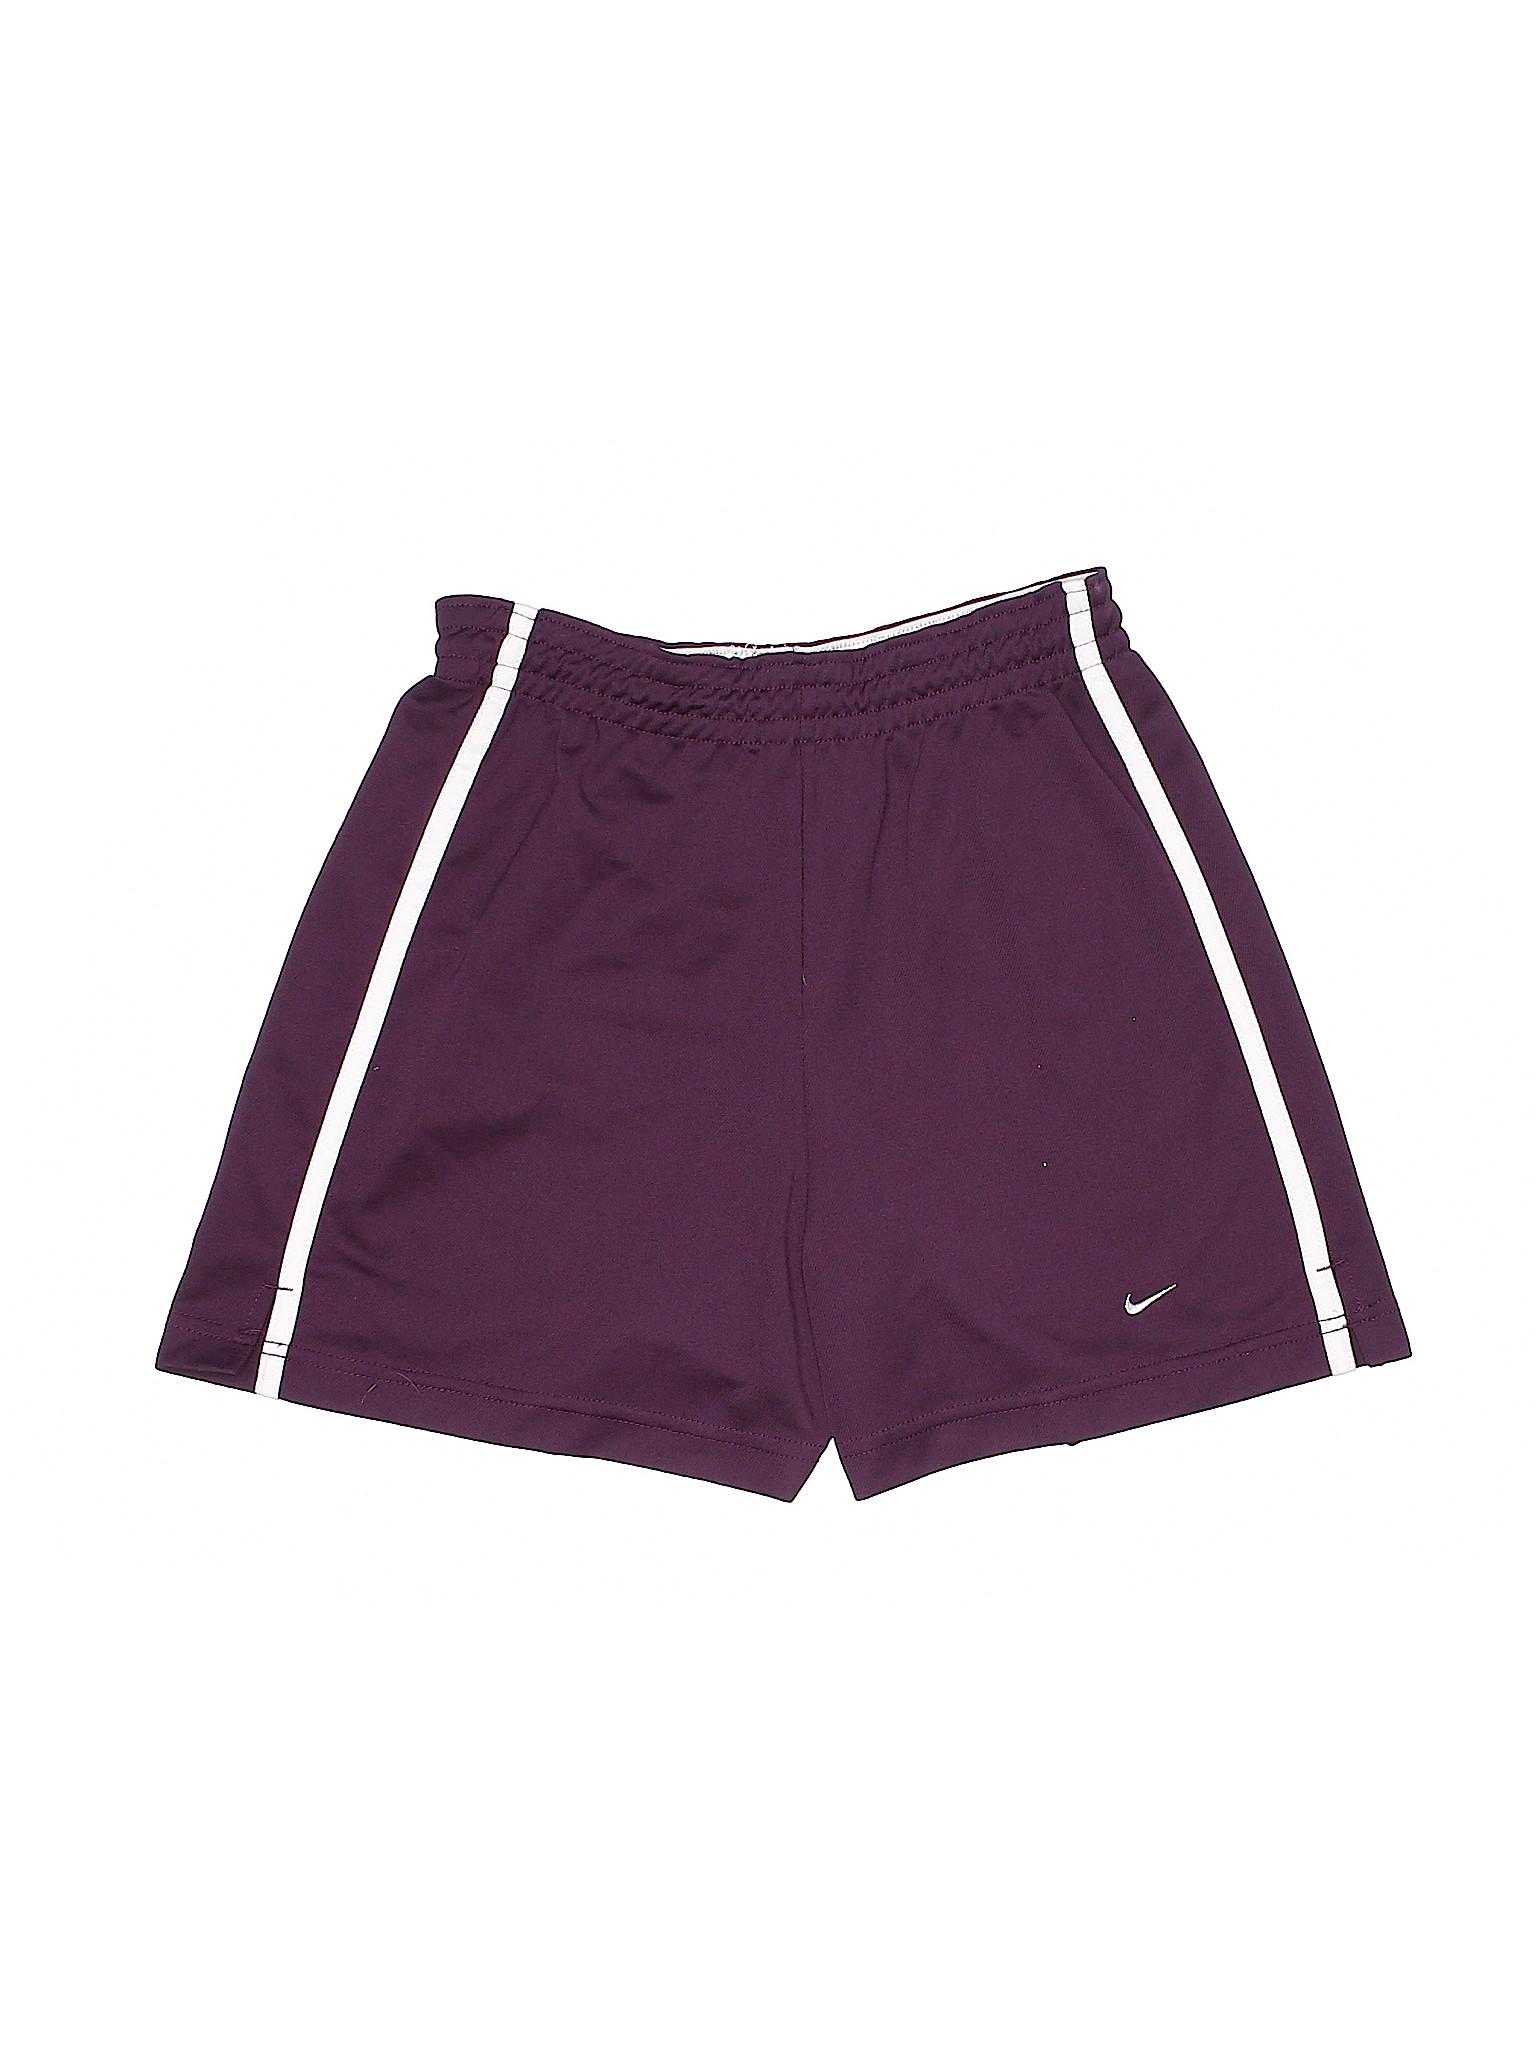 Boutique Shorts Boutique Athletic Nike Shorts Athletic Boutique Athletic Shorts Athletic Shorts Nike Nike Athletic Boutique Nike Boutique Nike COaRq